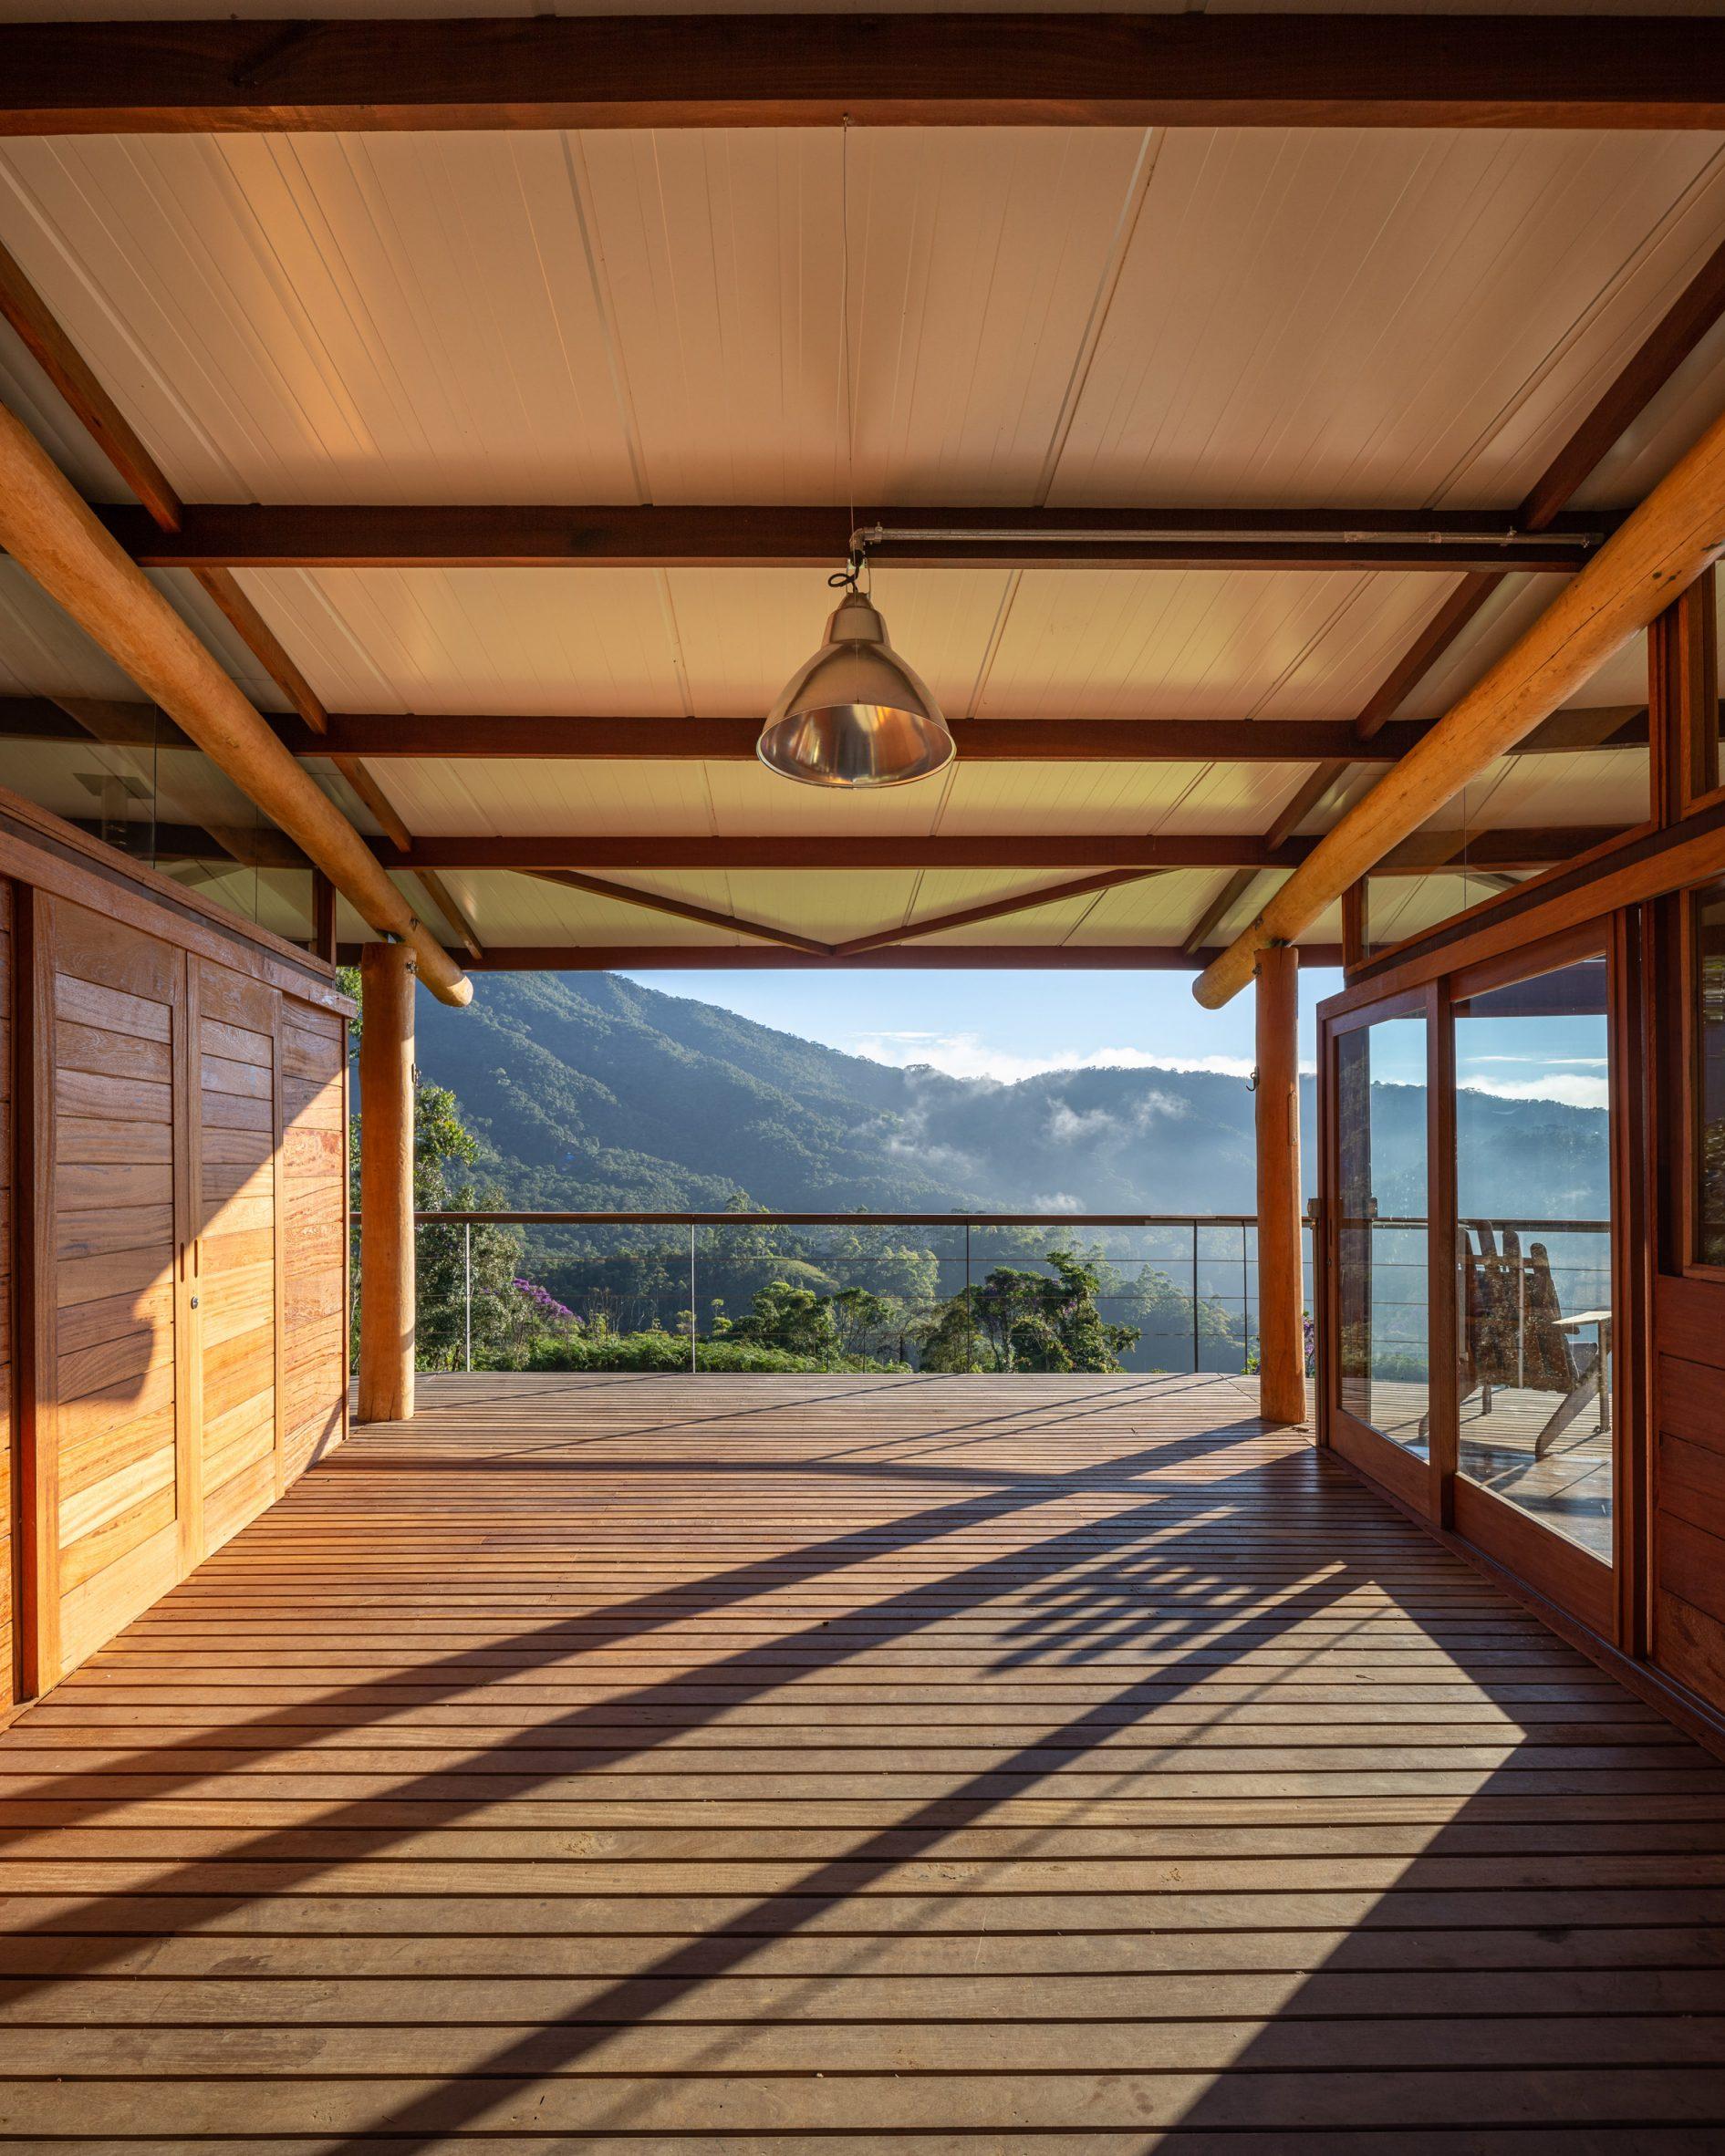 Gui Paoliello Morro Cavado House Brazil breezeway entrance